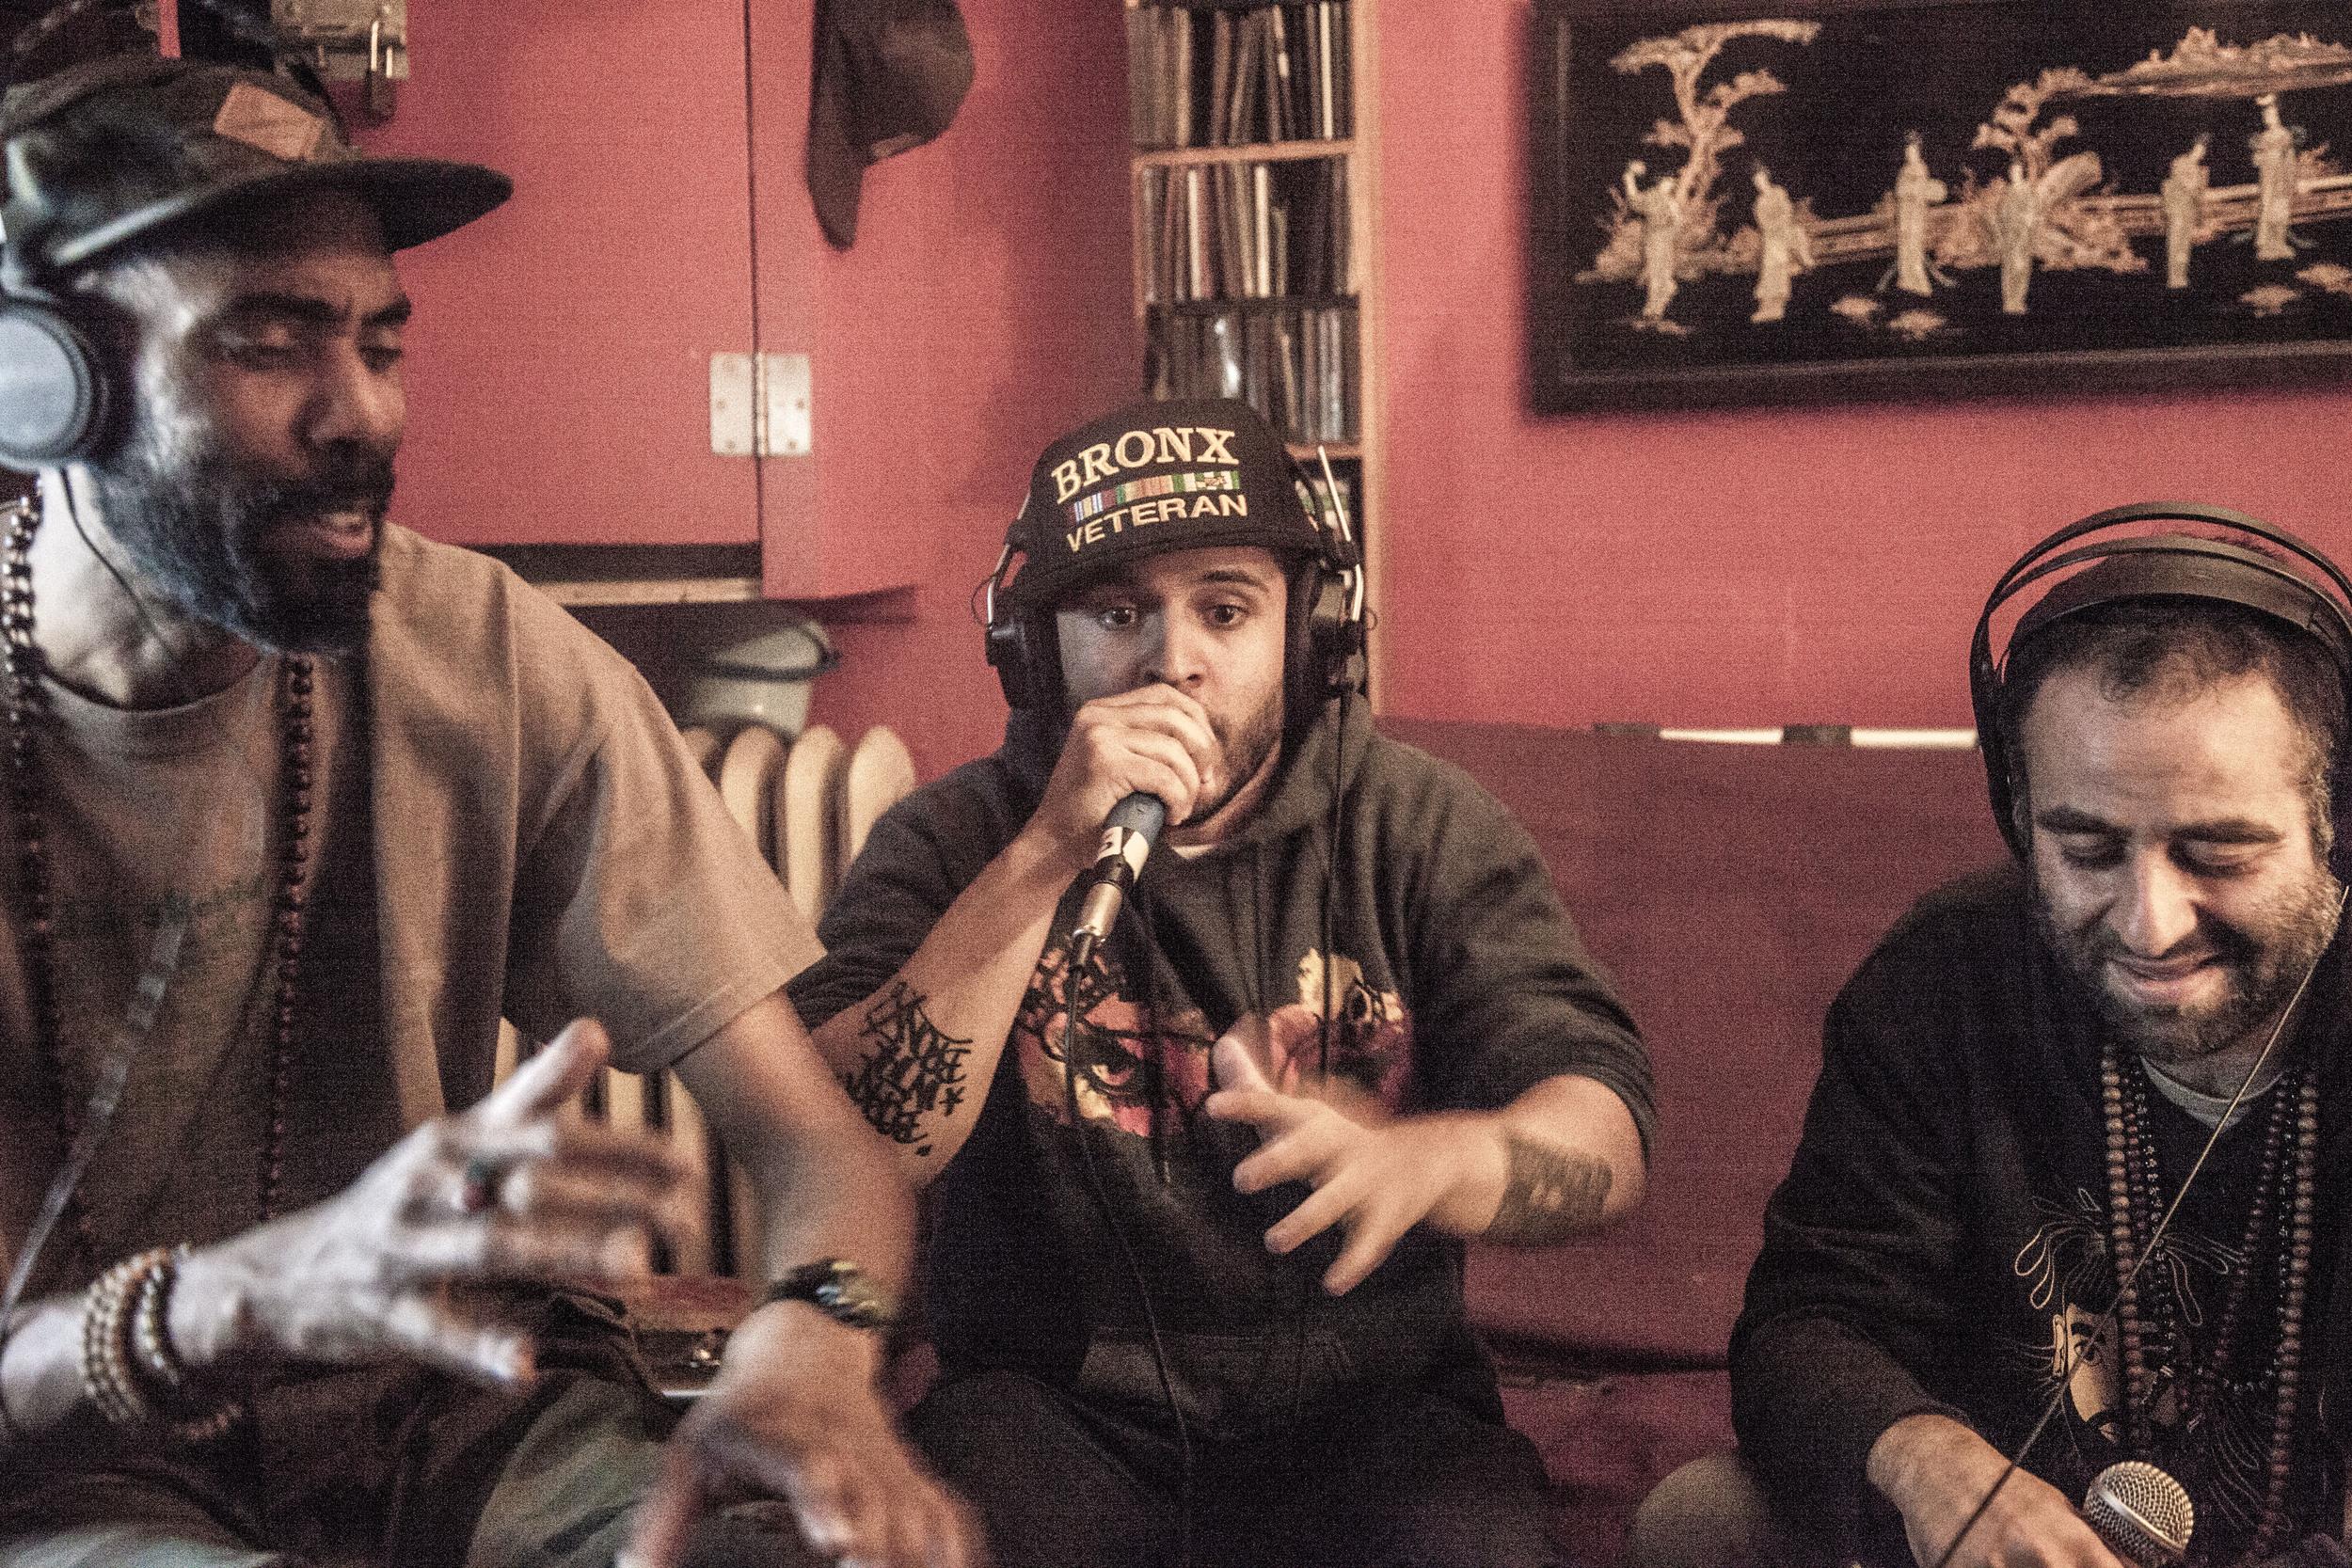 Guerrilla Grooves Radio. Cypher featuring L.I.F.E. LONG, Intikana and Dahesh. TME Pro Studios. Bronx, NYC. September 2015.